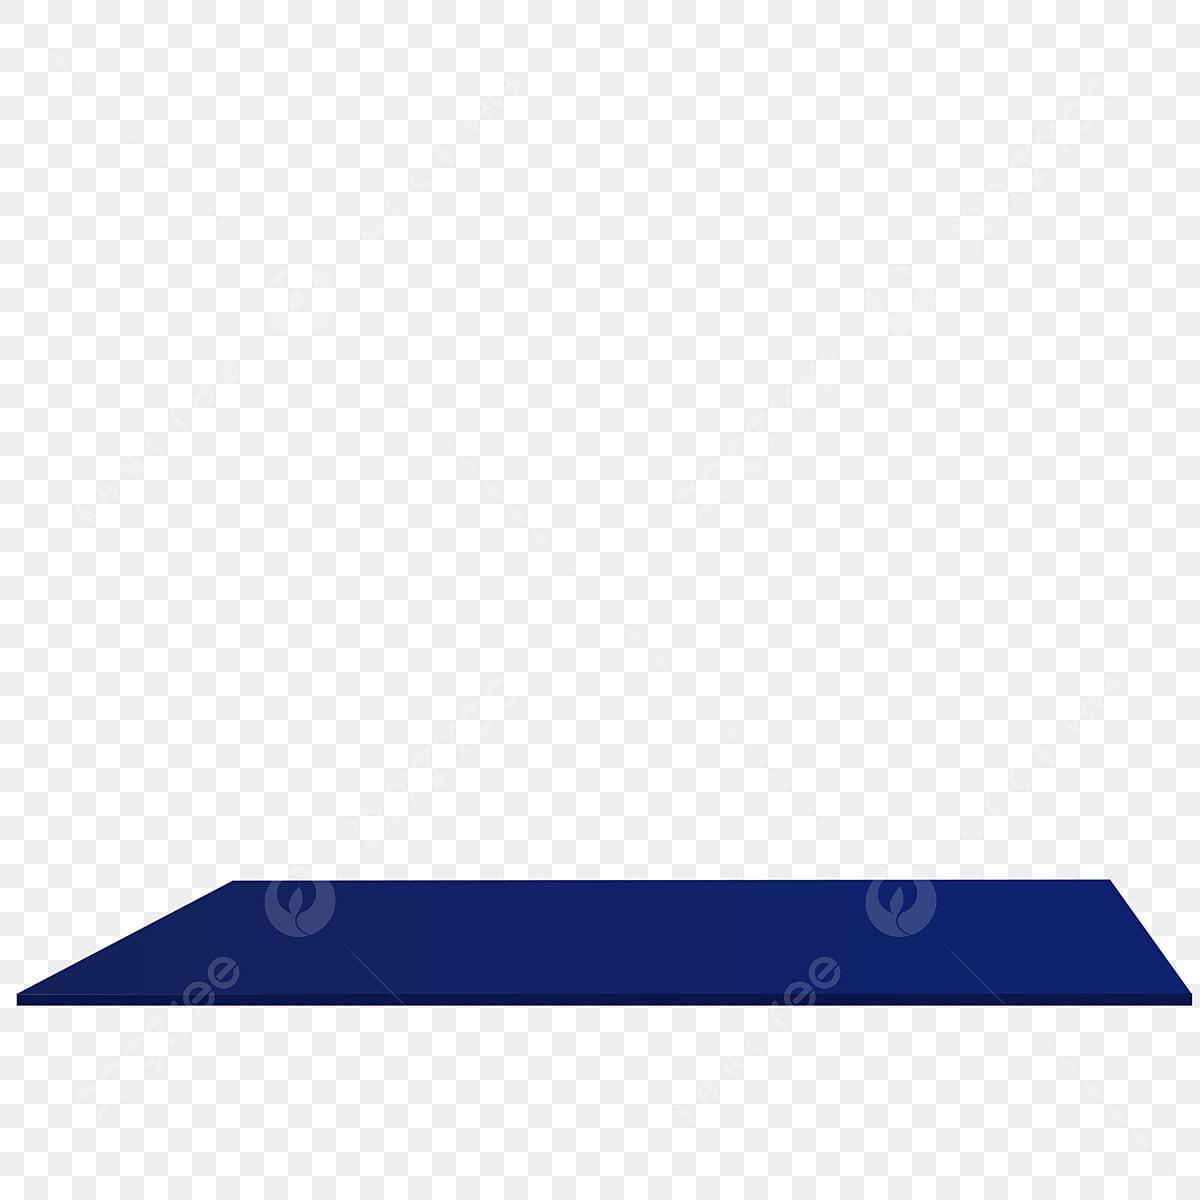 Yoga Mat Cartoon Png Material Simple Yoga Mats Floor Mats Mats Png Transparent Clipart Image And Psd File For Free Download